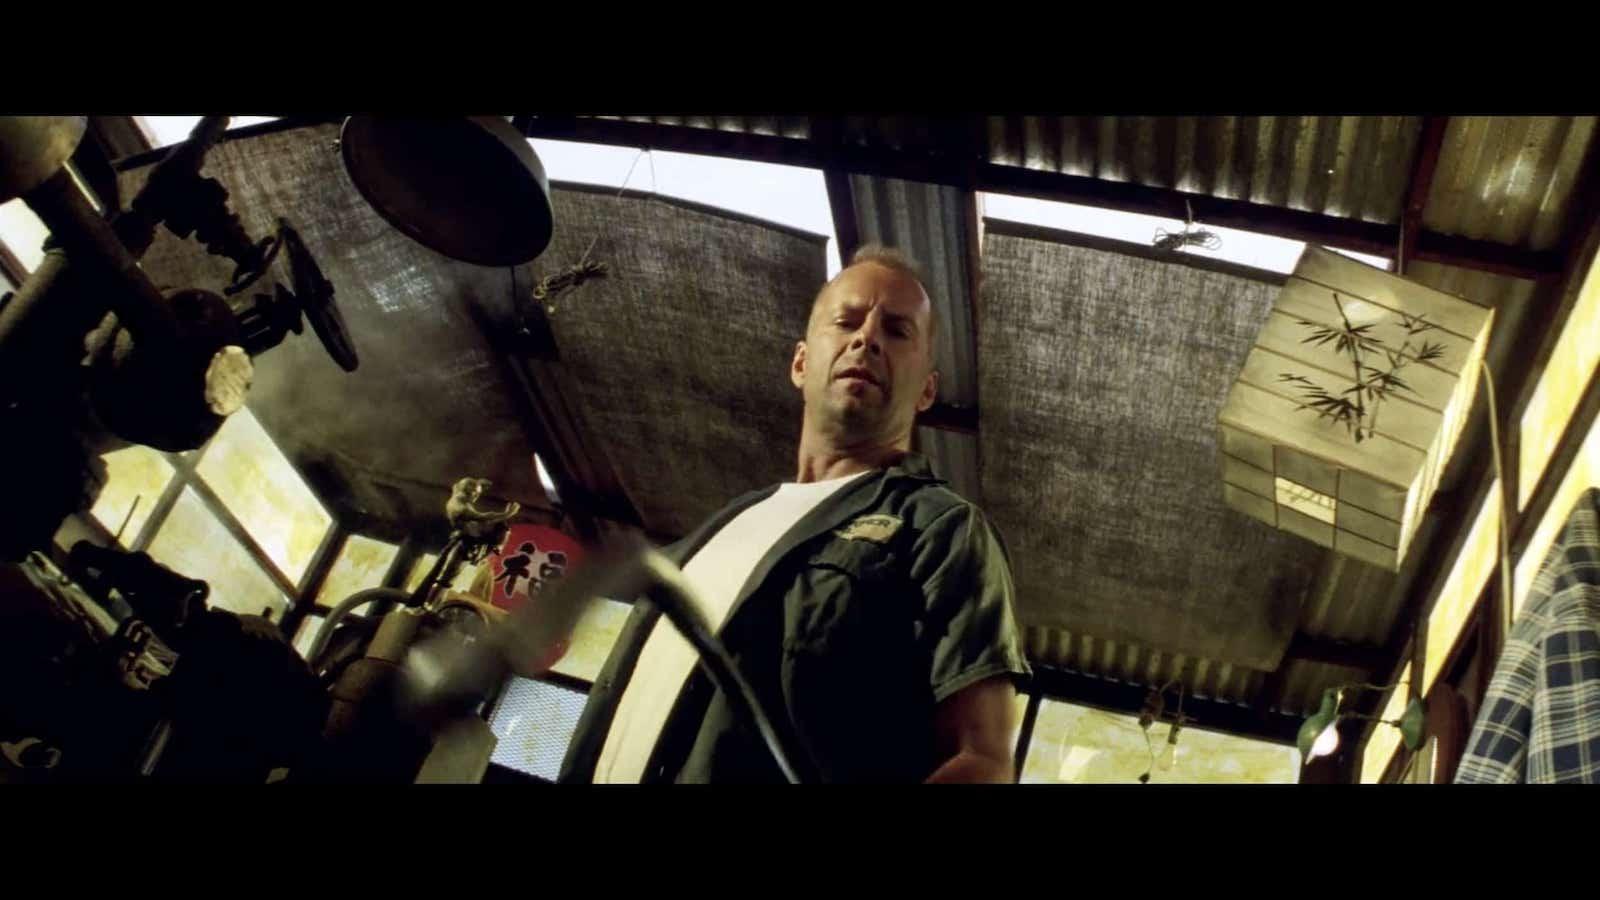 A Filmmaker's Guide to Michael Bay - Armageddon - Eyetrace - StudioBinder Online Shot List Software